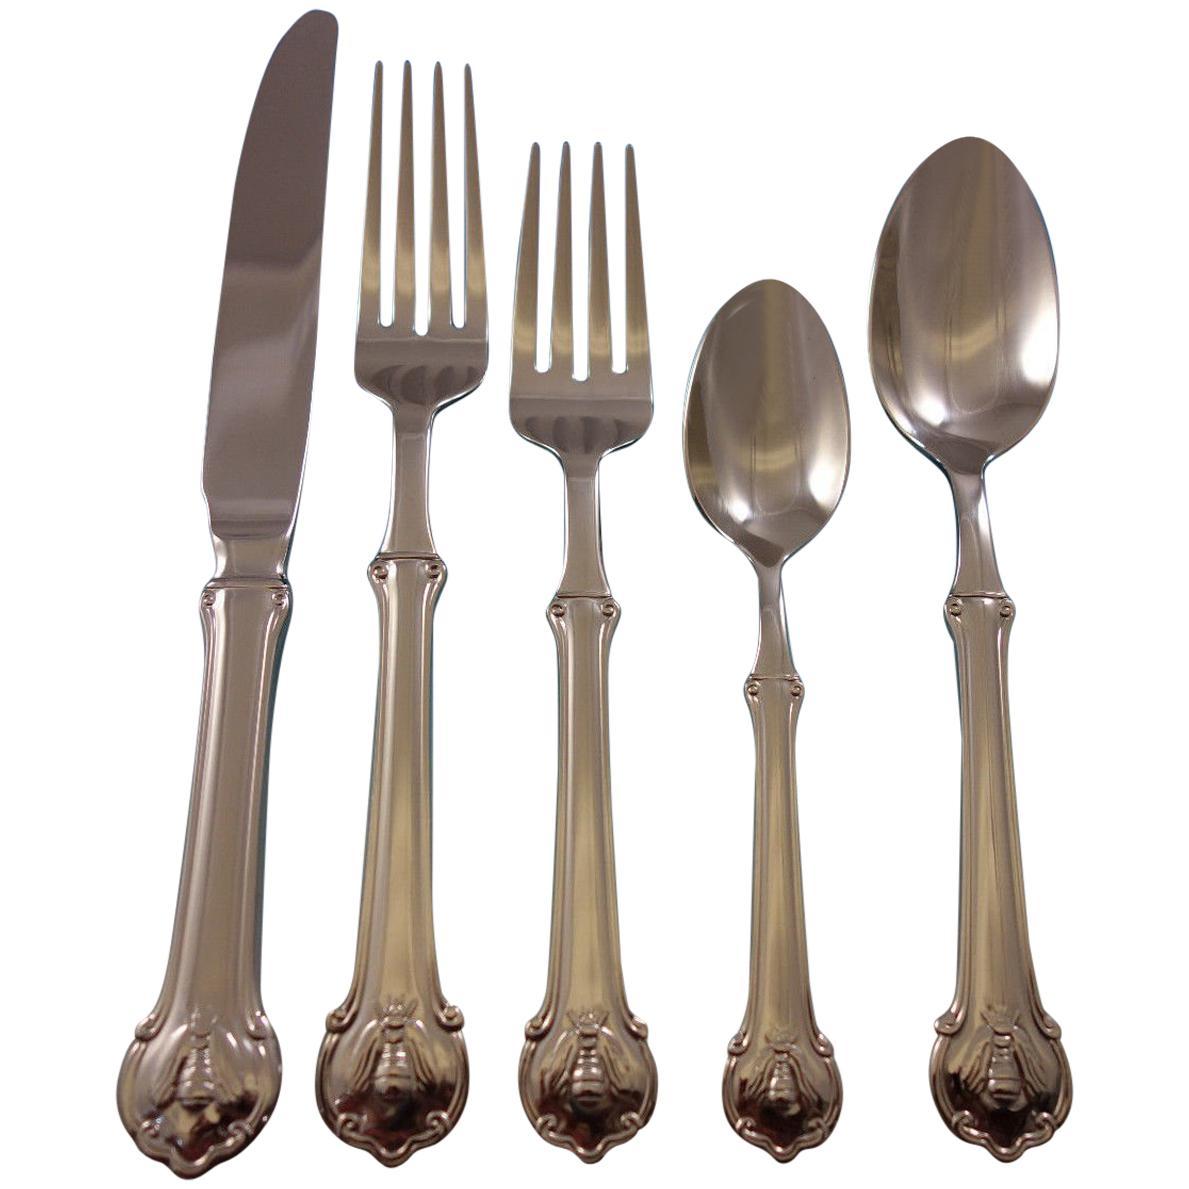 Wallace Napoleon Bee 18//10 Stainless Steel 6 3//8 Teaspoon Set of Twelve